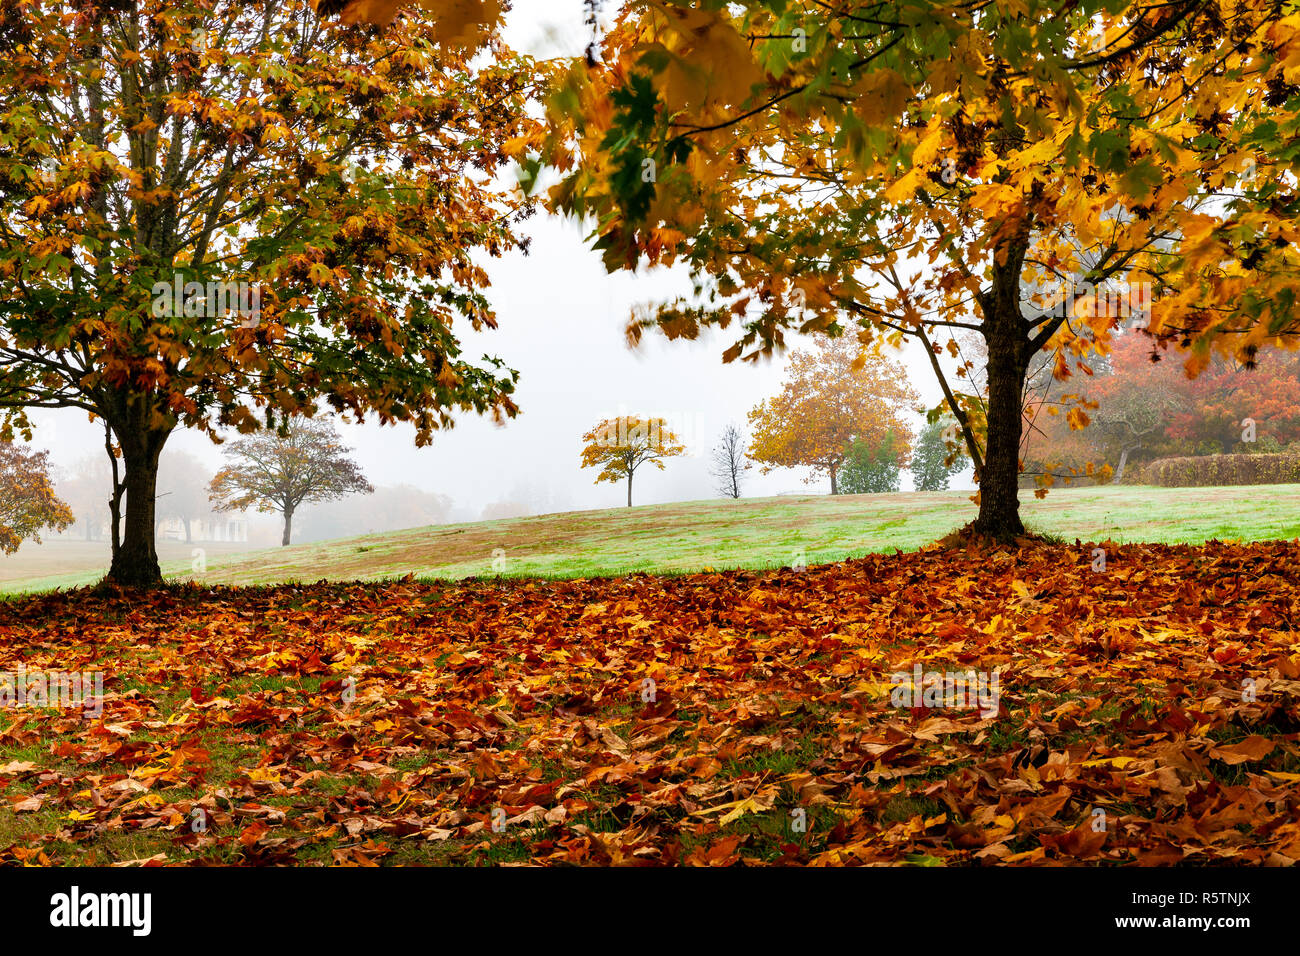 WA17013...WASHINGTON - Foggy autumn day in Seattle's Discovery Park. - Stock Image